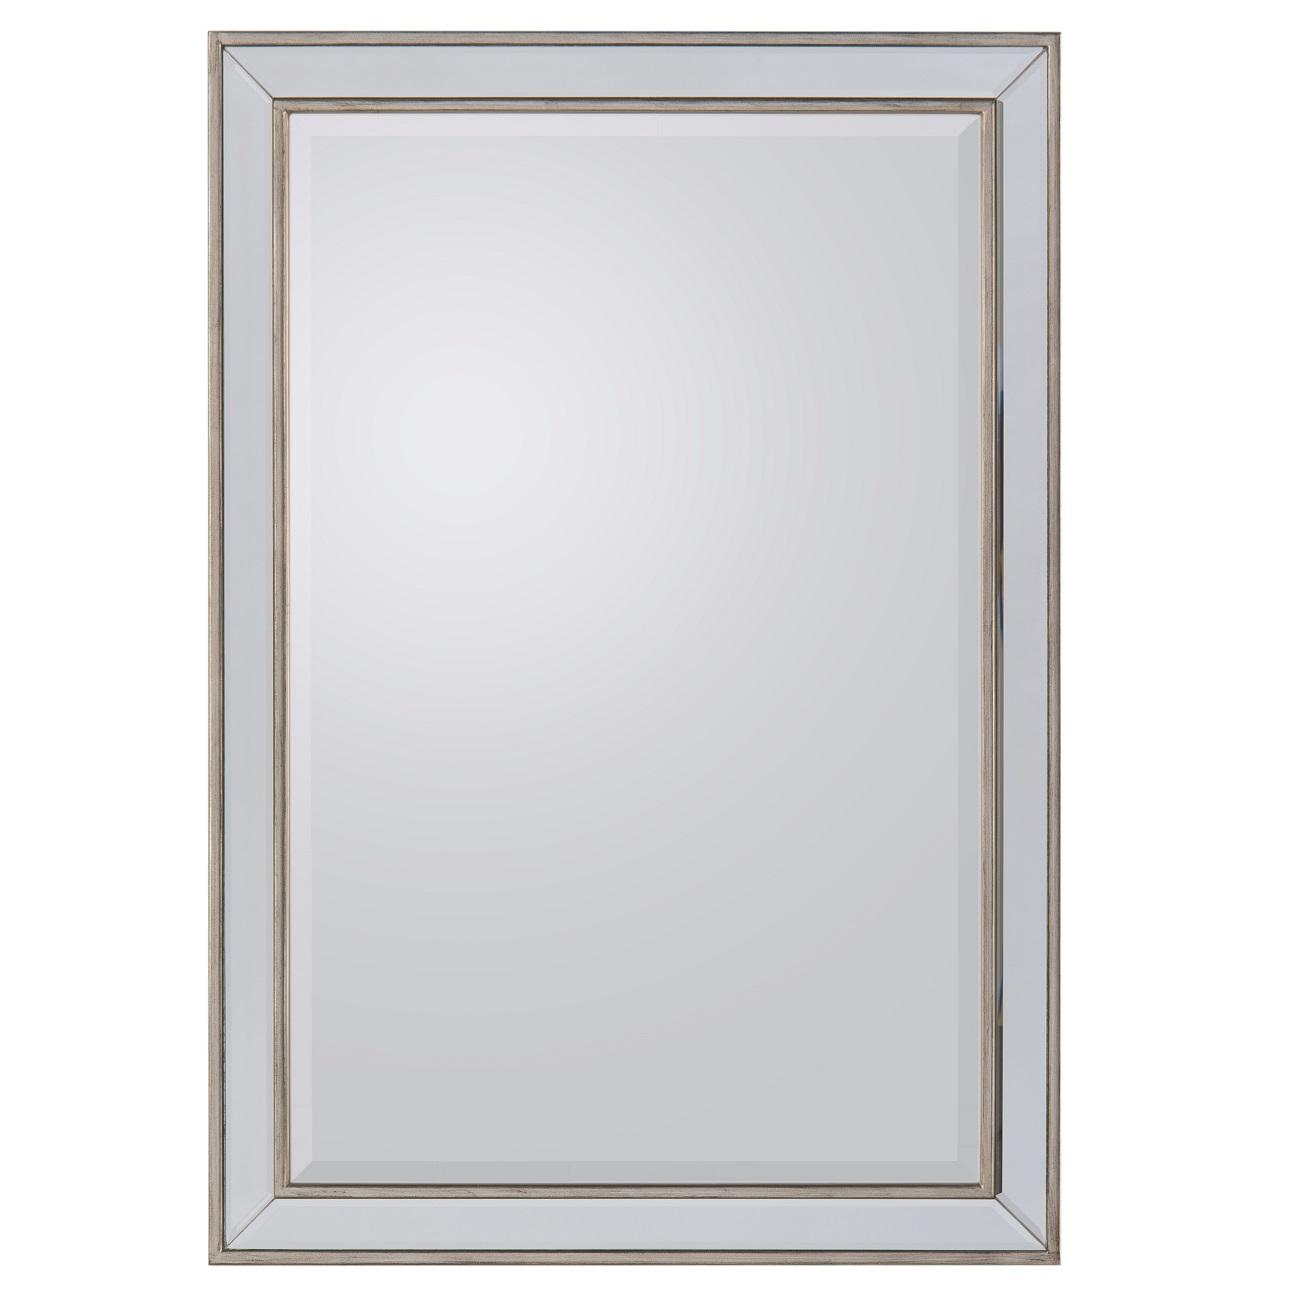 Silver Wood Framed Mirror, John Richard Mirror